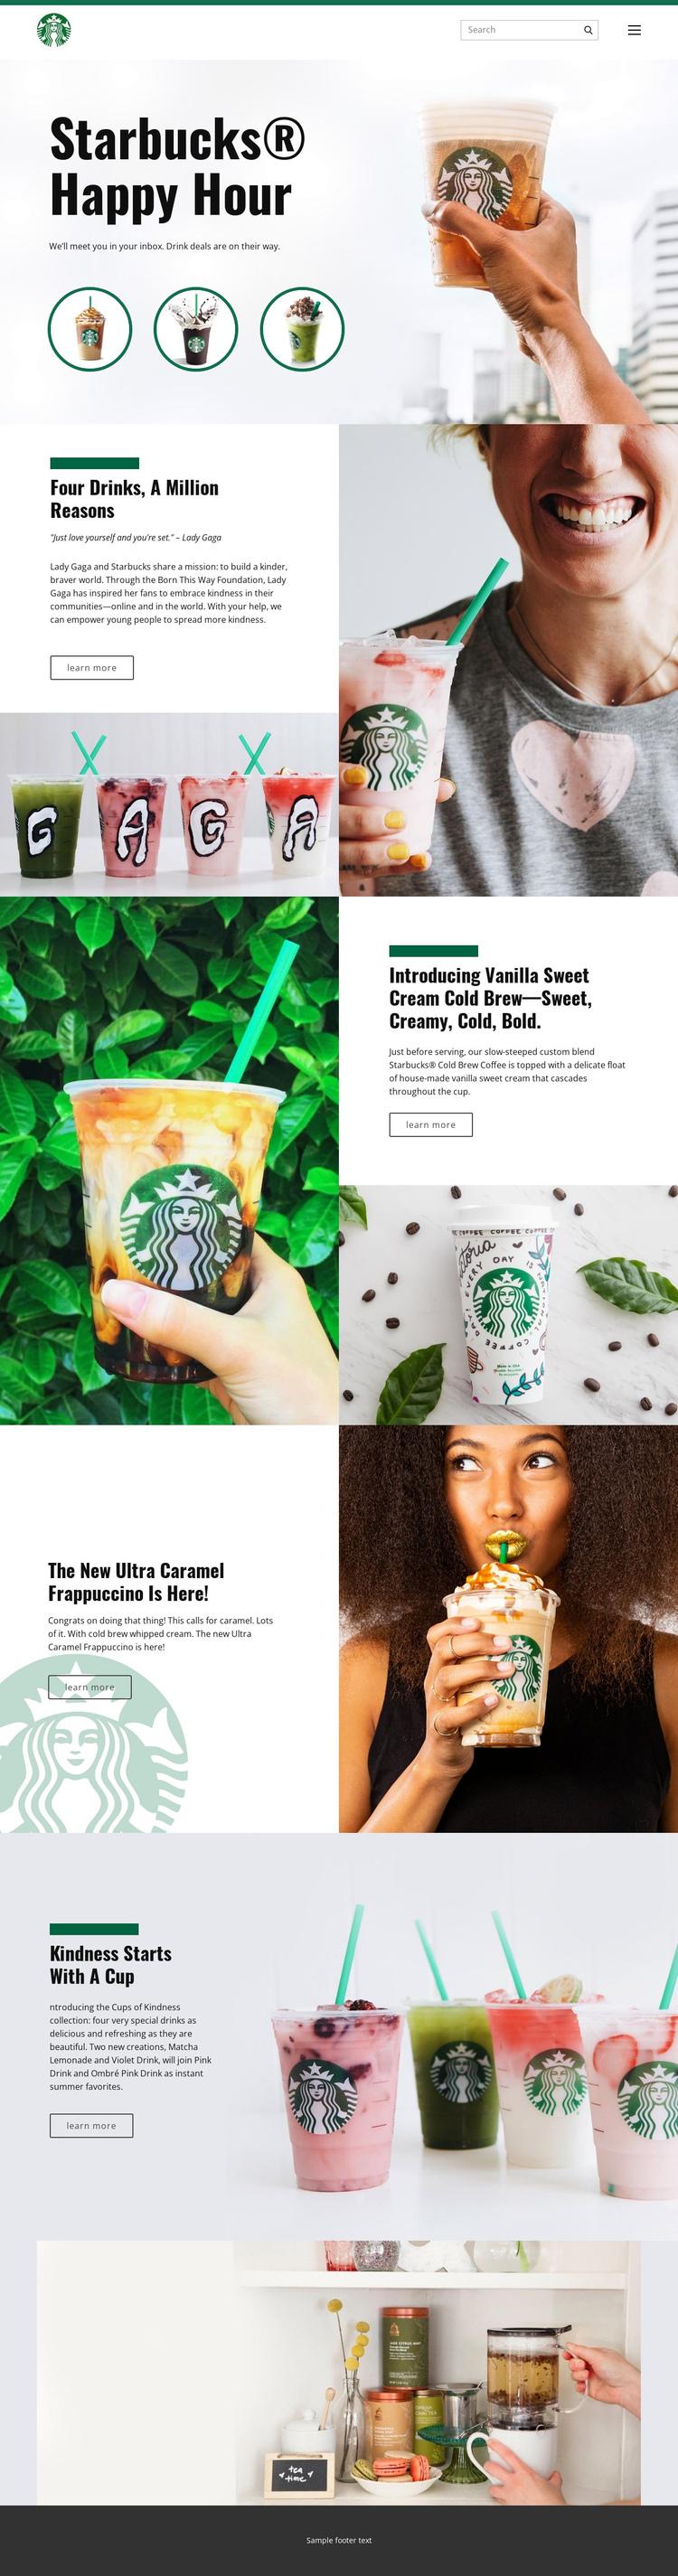 Starbucks Coffee Website Builder Software